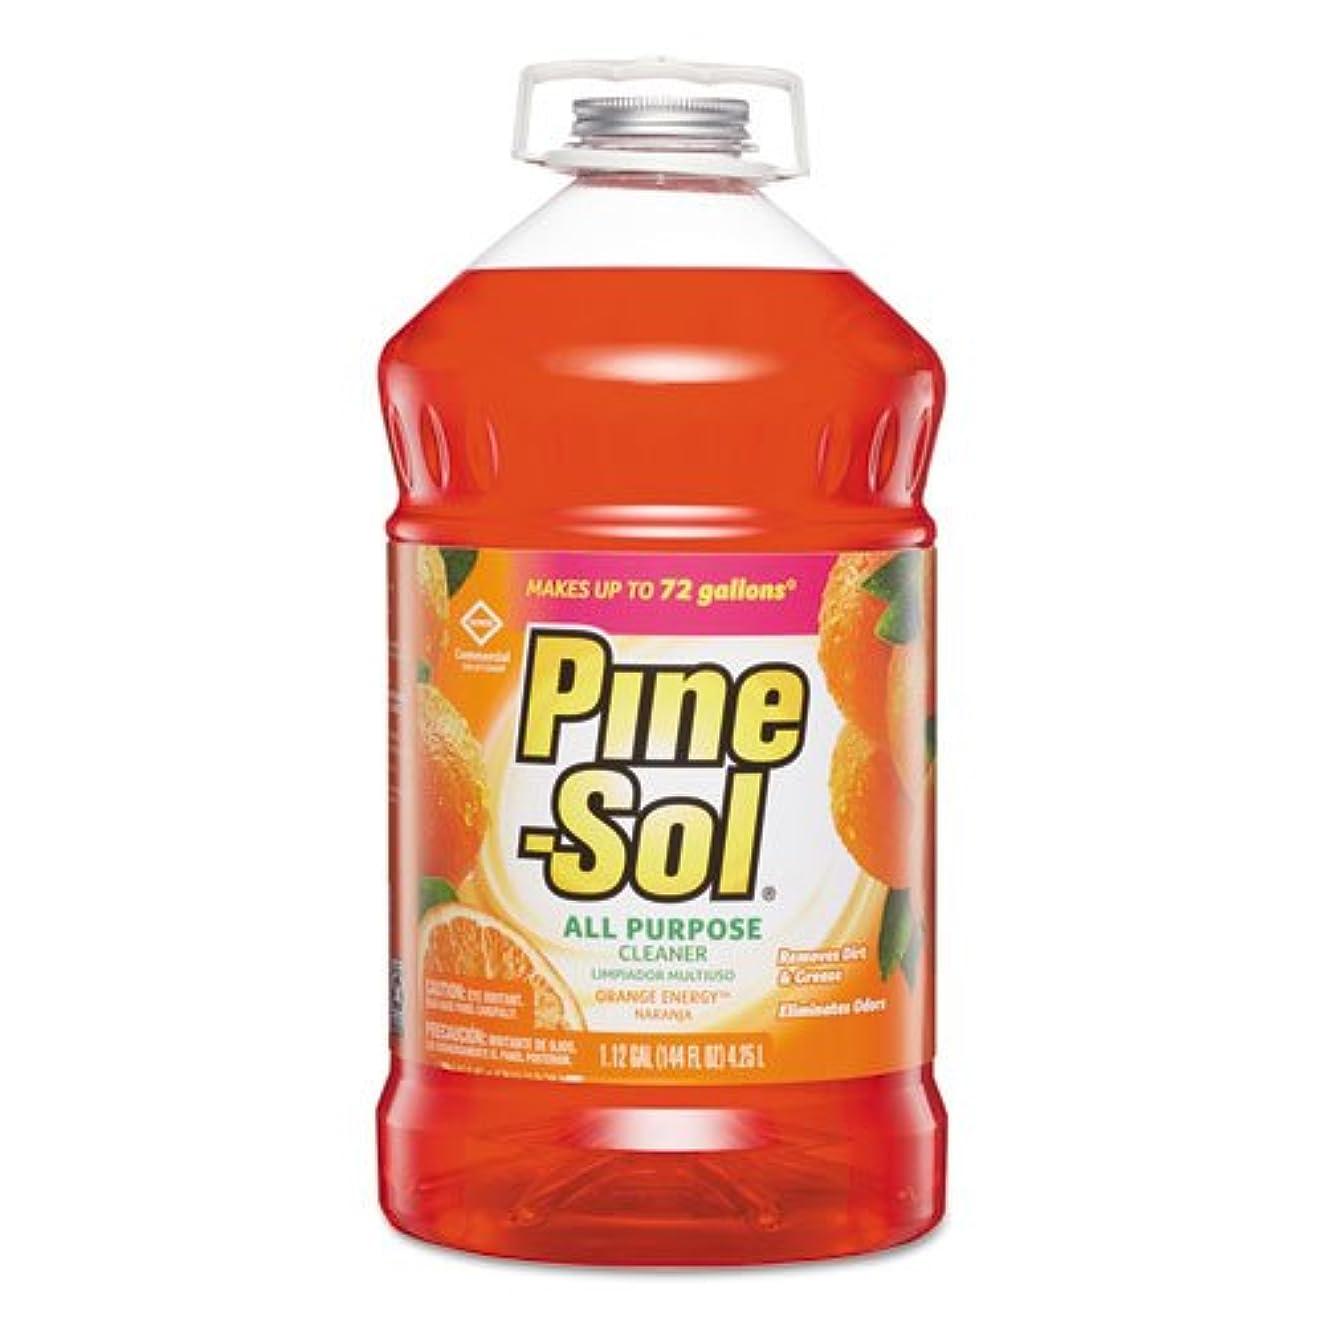 Pine-Sol(R) Orange Energy(R) Cleaner, 144 Oz, Box Of 3